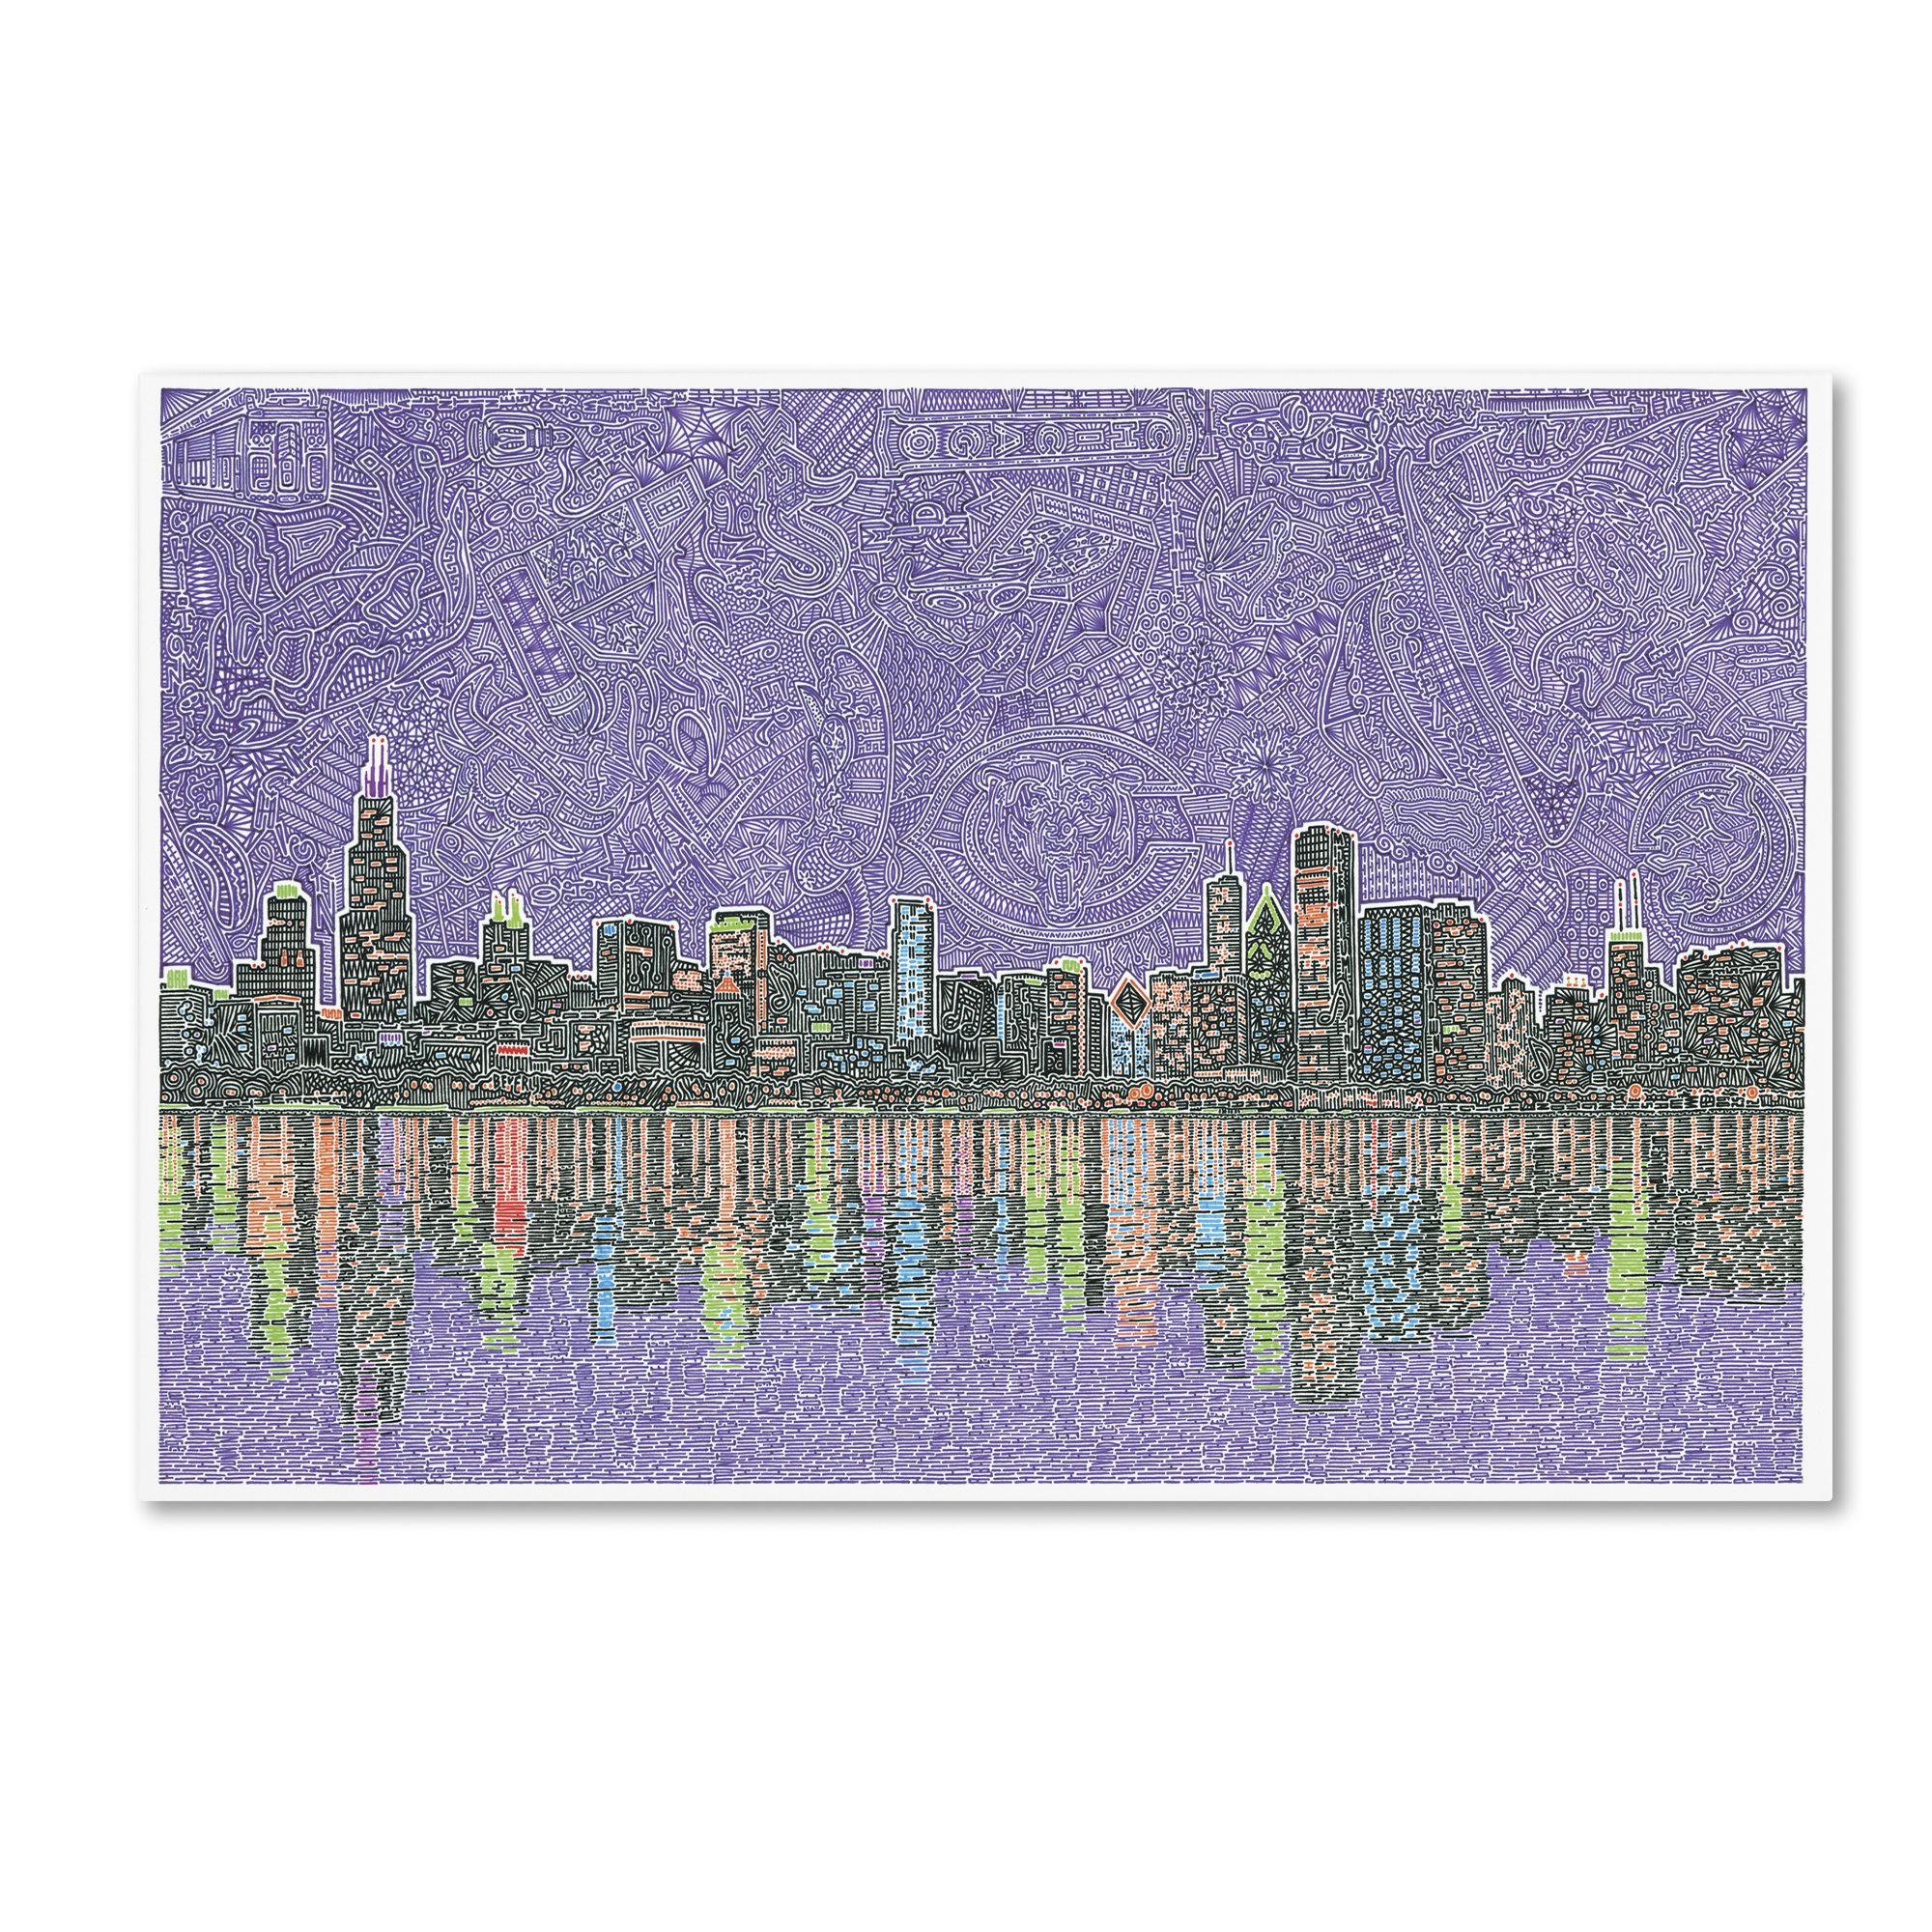 Viz Art Ink 'Chicagoland' Canvas Art 16 x 24